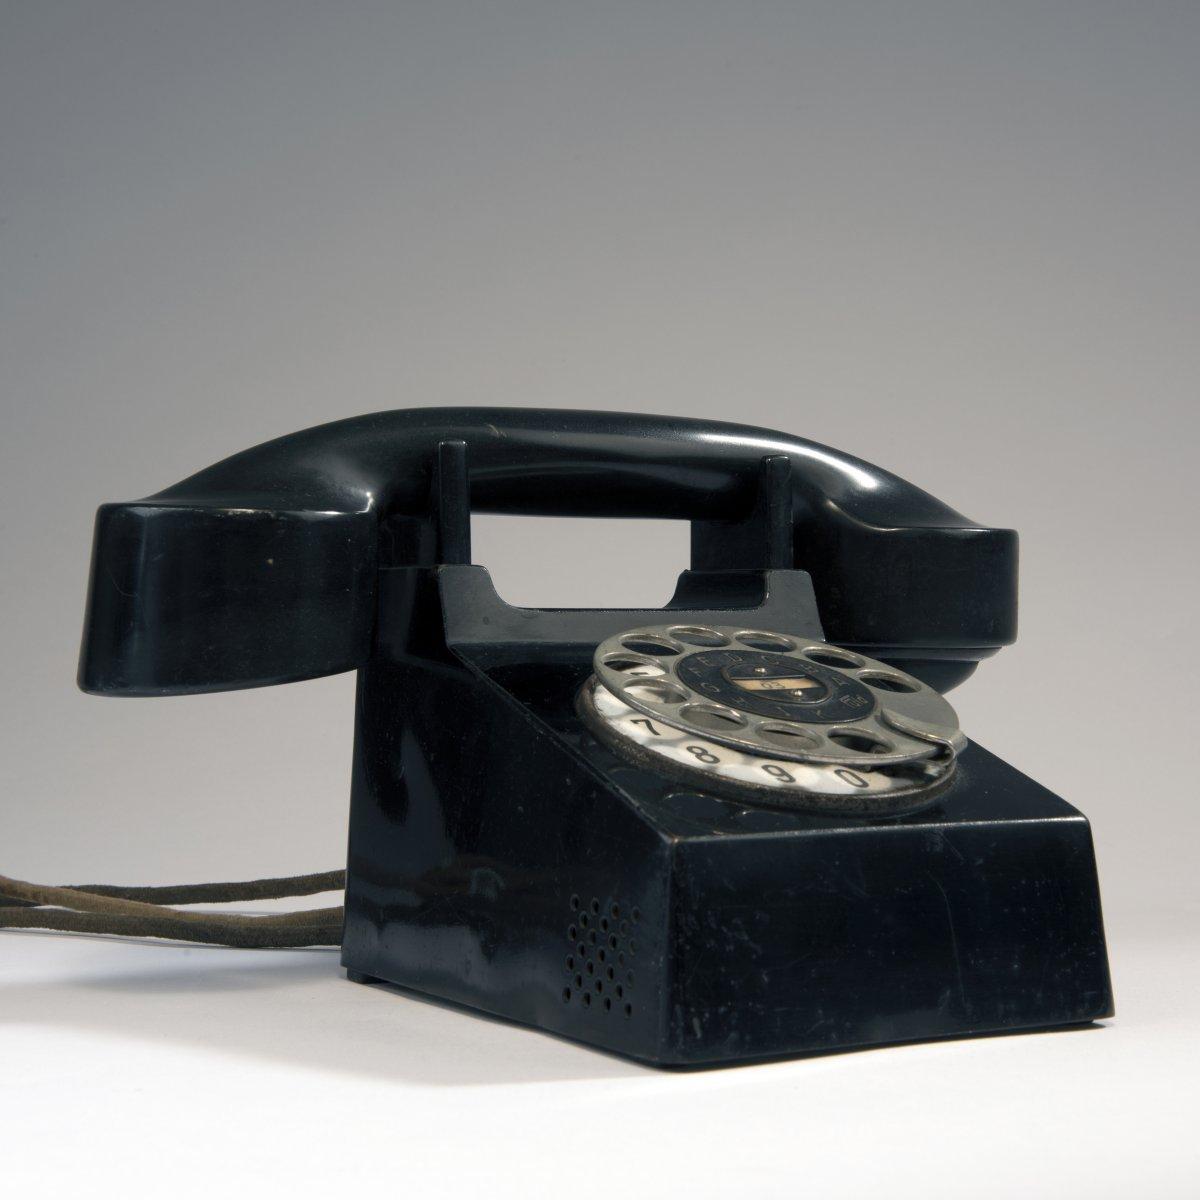 Los 55 - Frankfurt , 'Bauhaus' Telefon 'Modell Frankfurt', 1929'Bauhaus' Telefon 'Modell Frankfurt', 1929H.